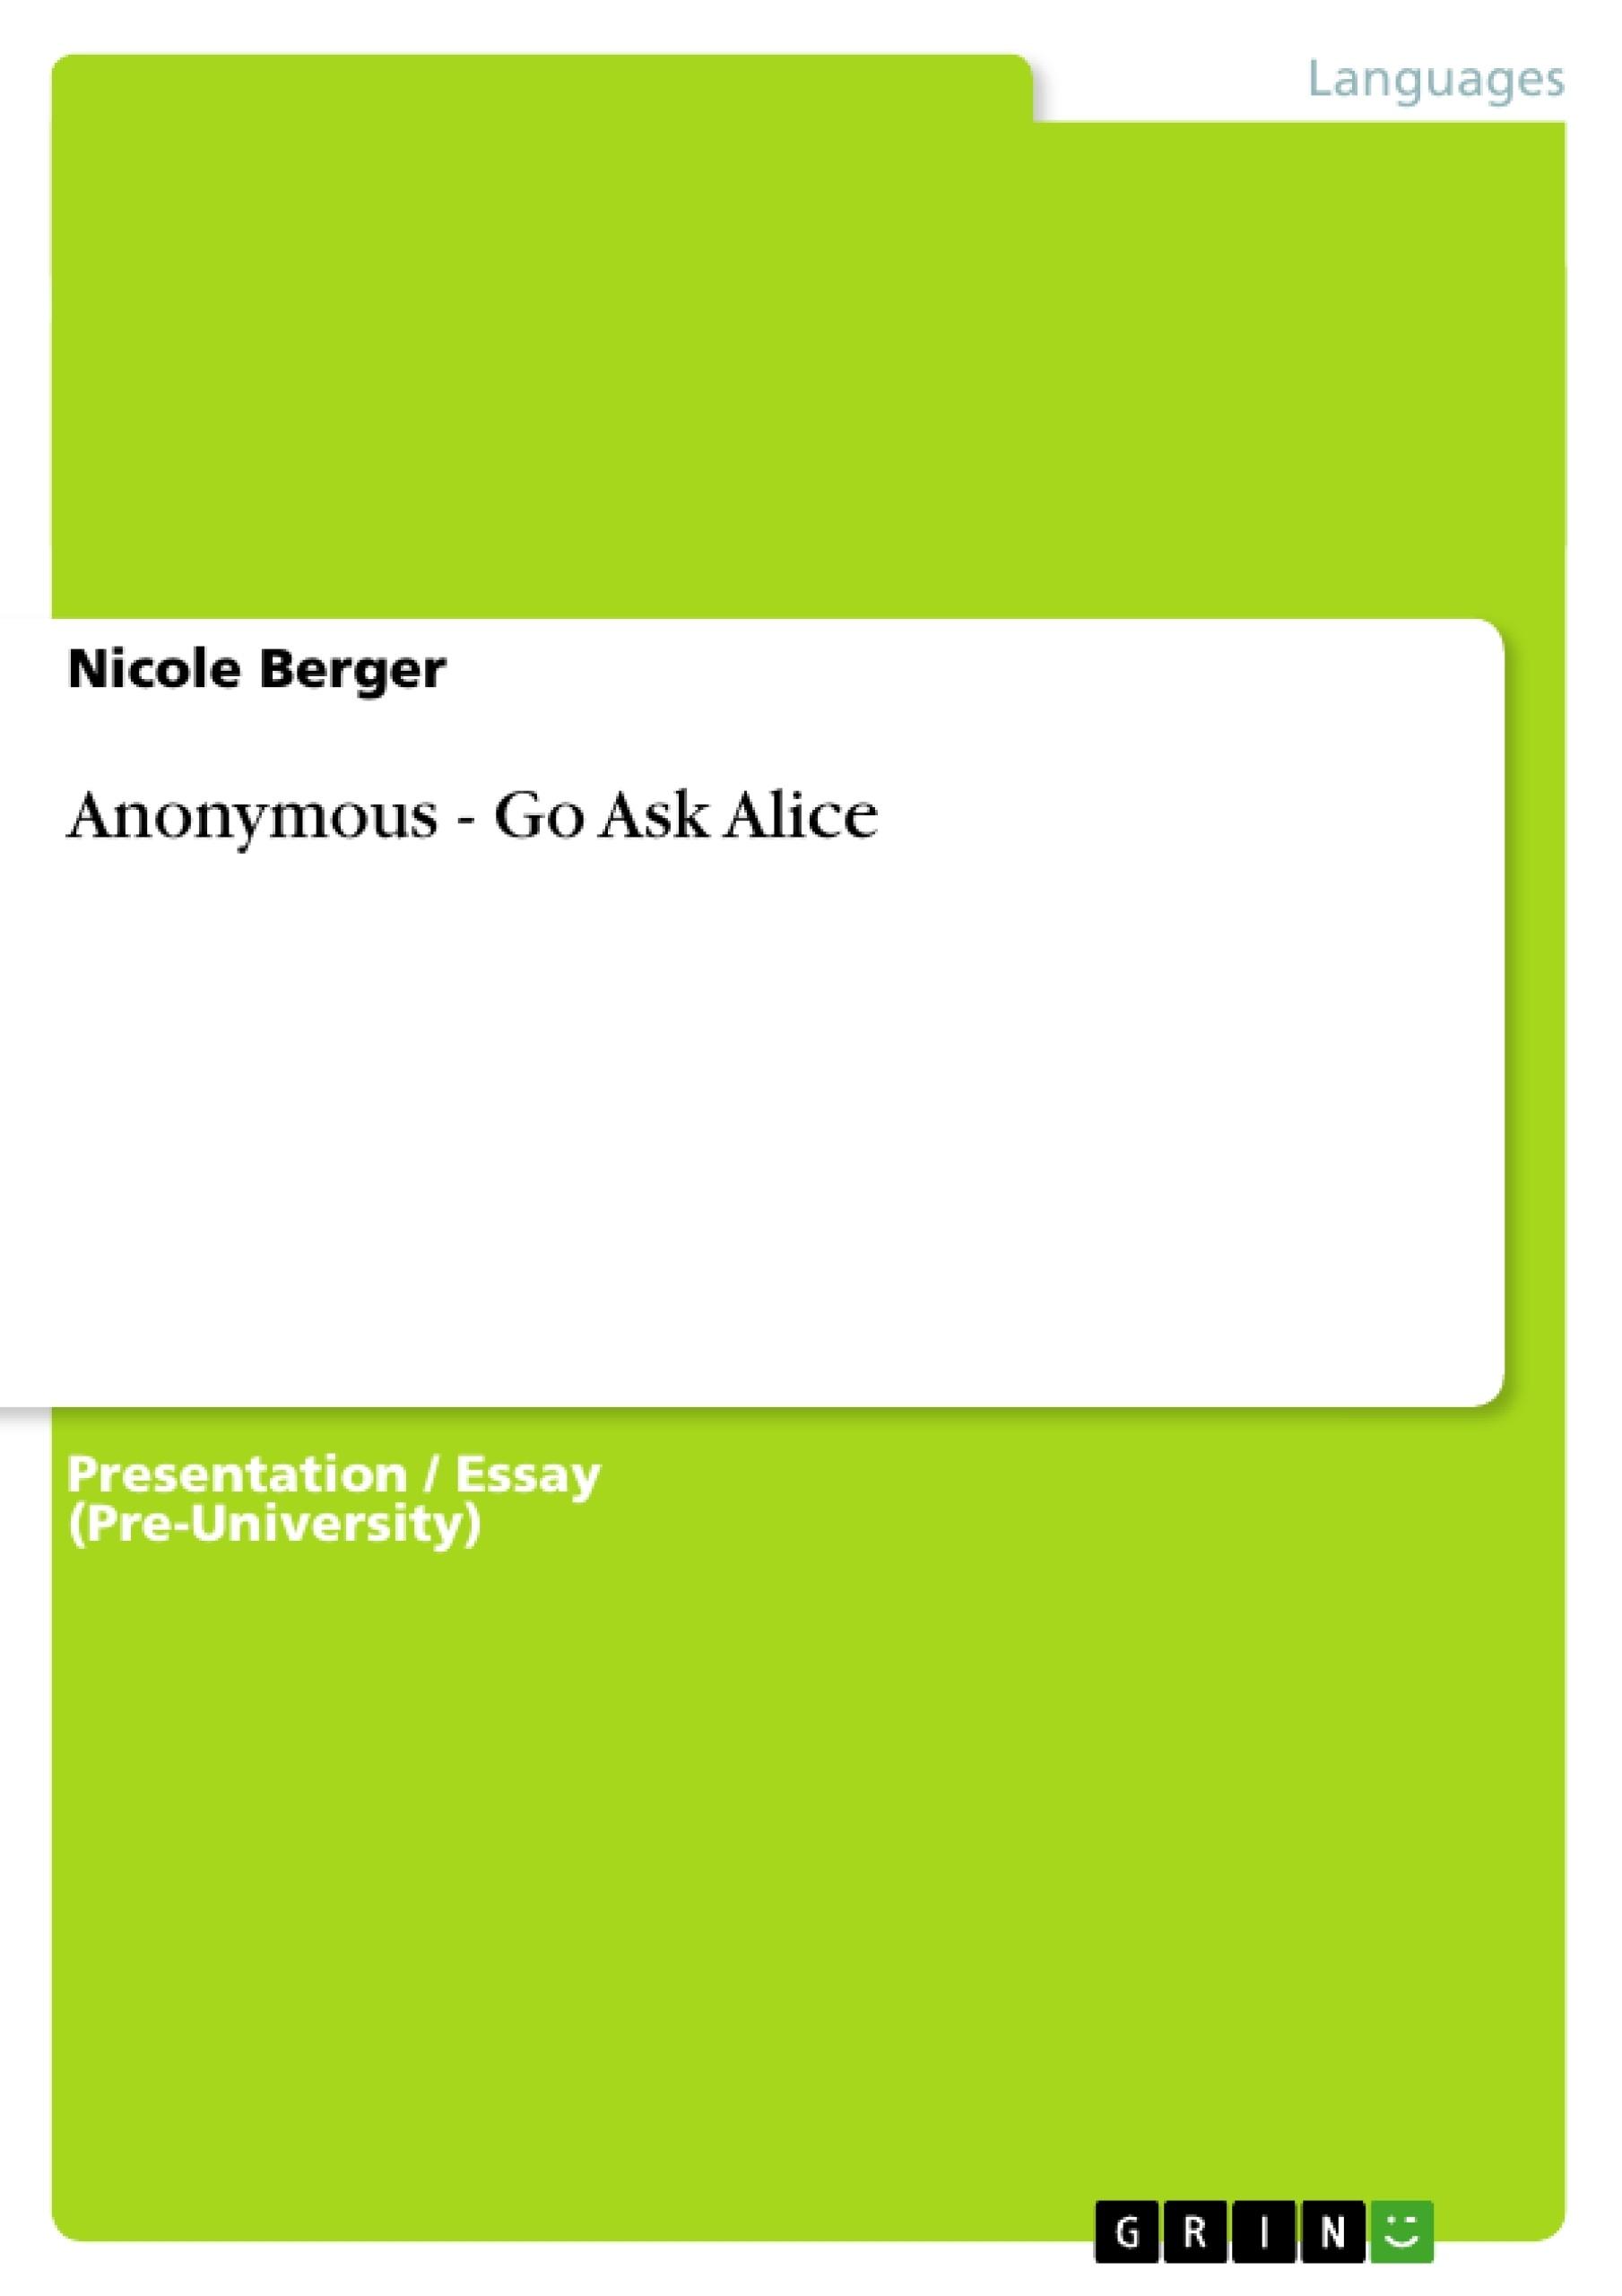 Go Ask Alice Essays | GradeSaver